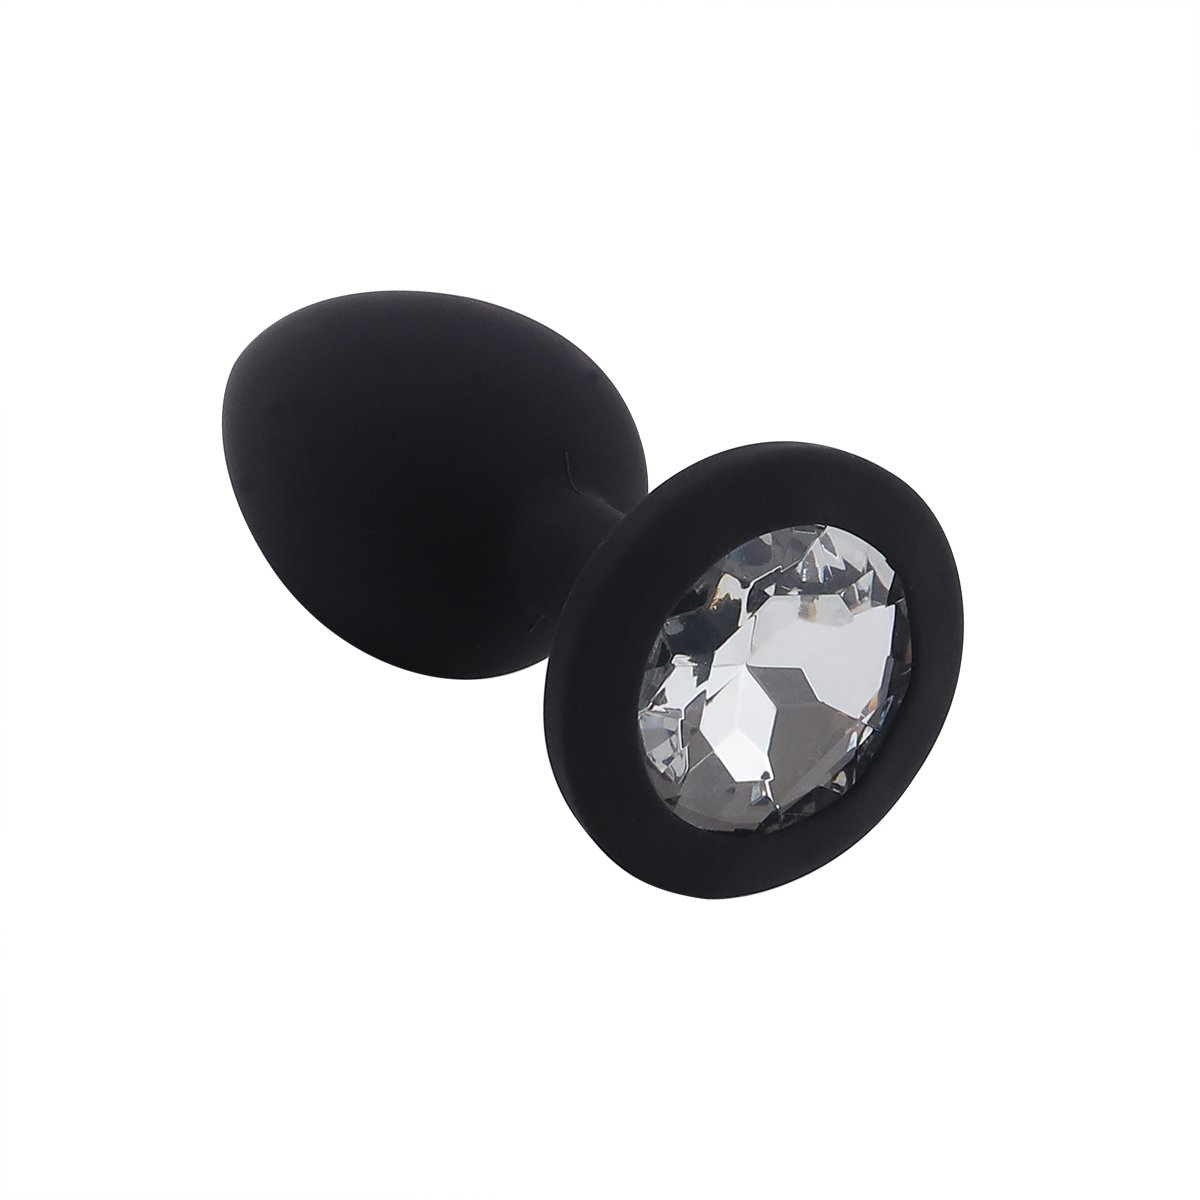 Foto van Banoch - Buttplug Penumbra White Small – Siliconen buttplug Zwart - Diamant steen - Wit